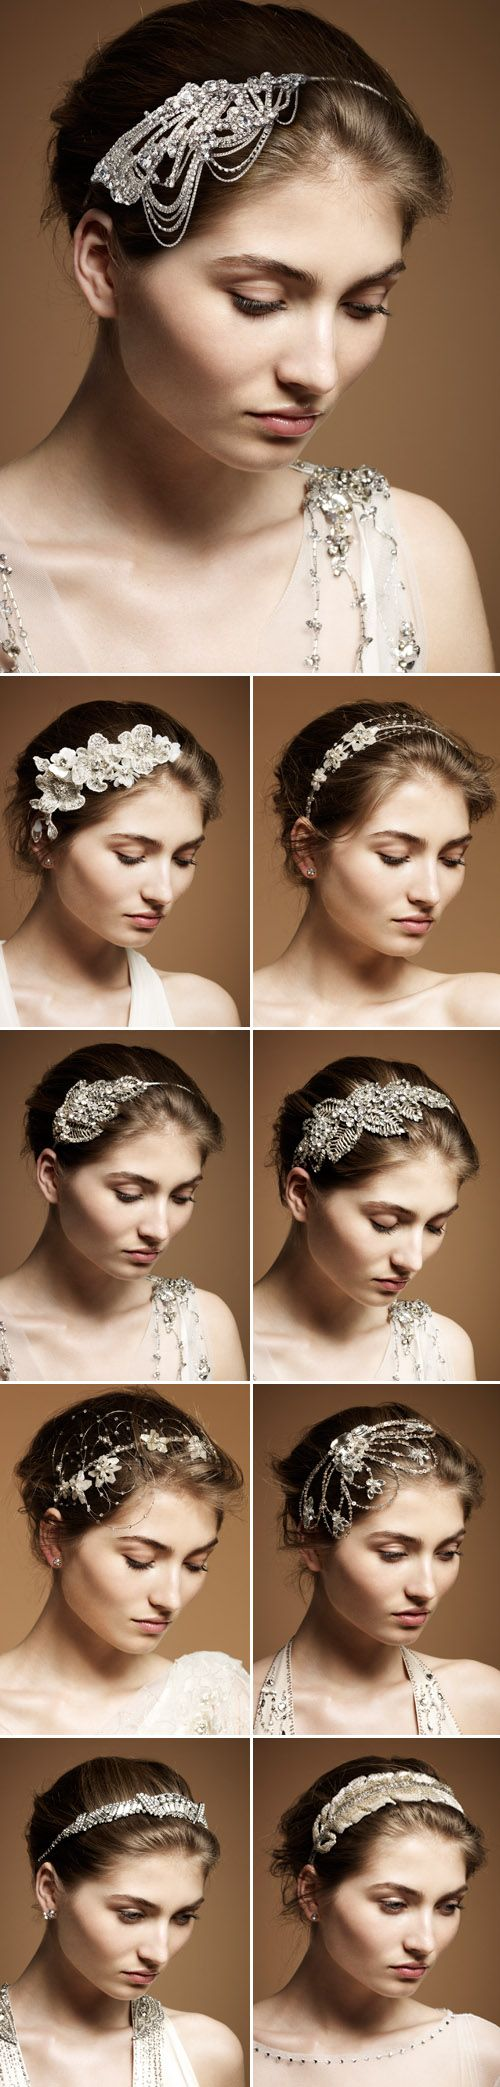 jenny packham spring-summer 2012 wedding dress/accessories